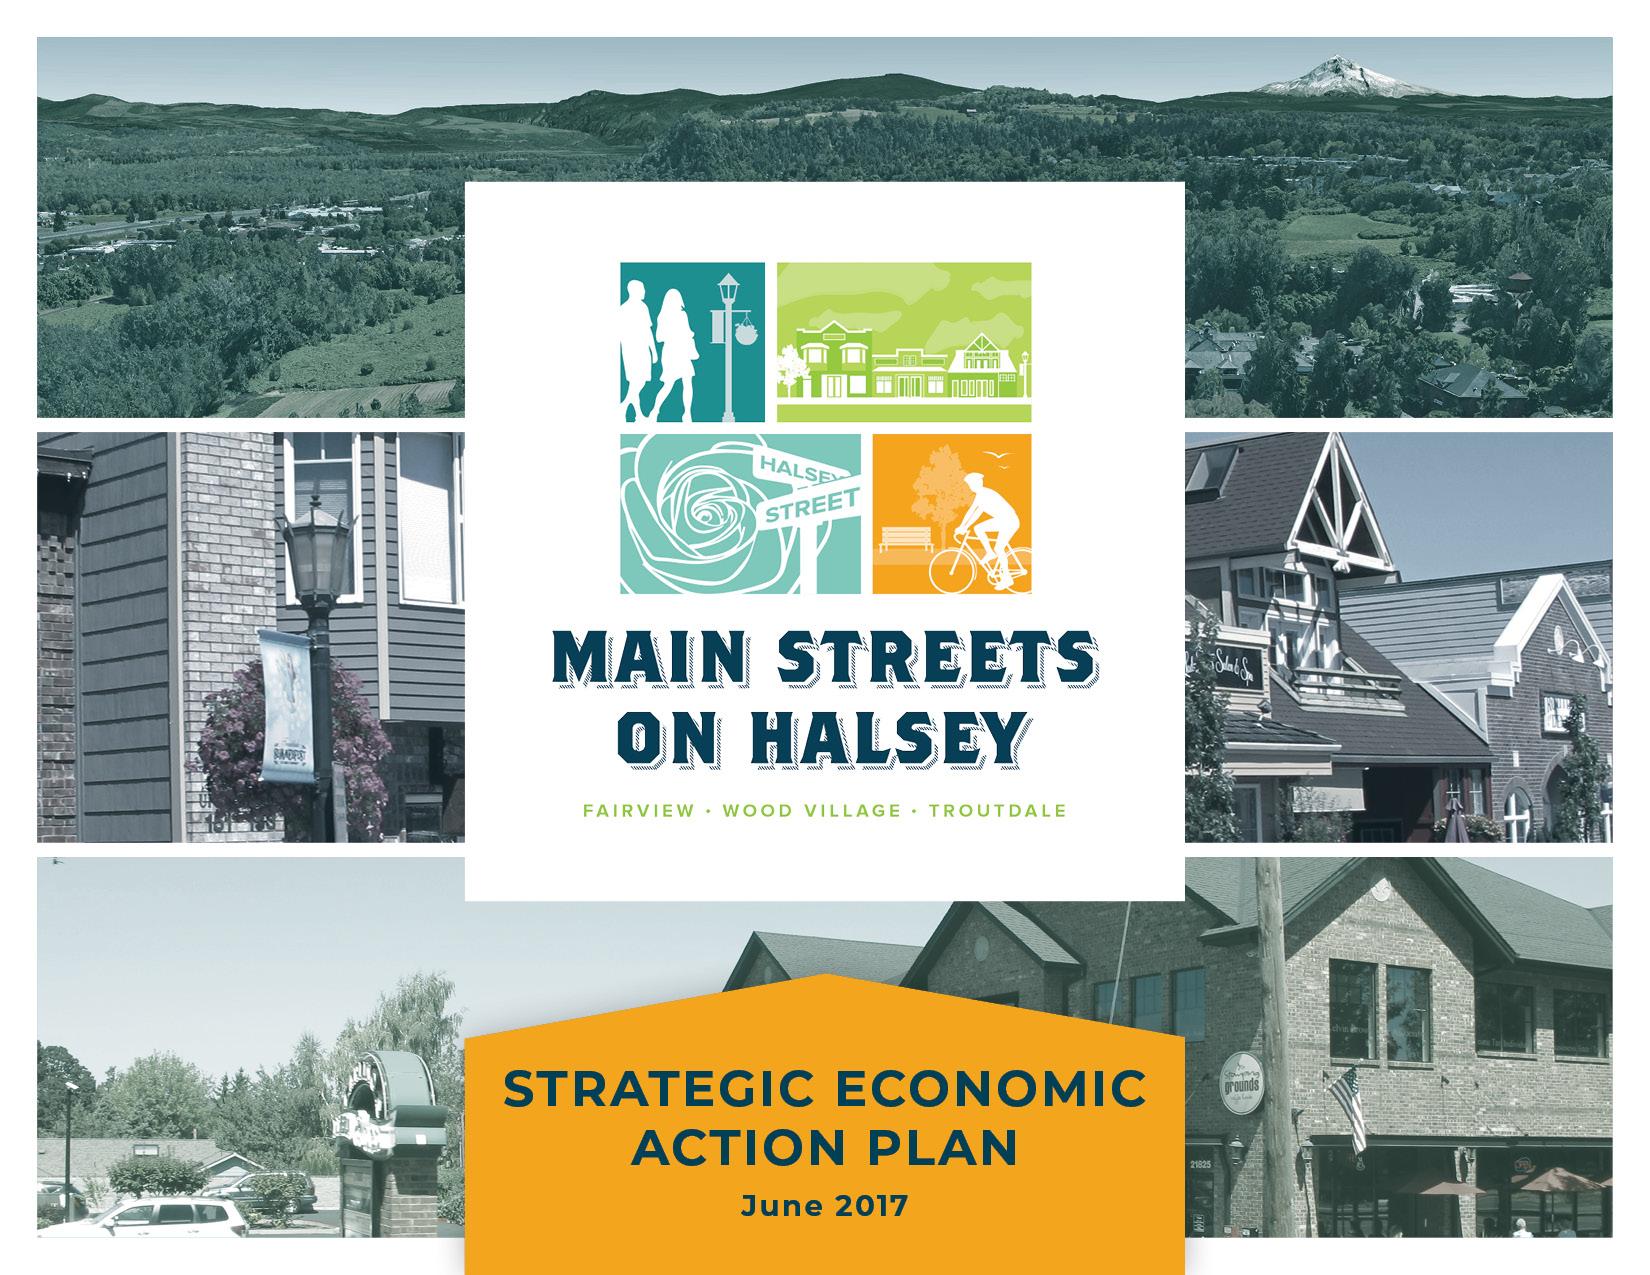 Halsey Corridor Project Image.jpg